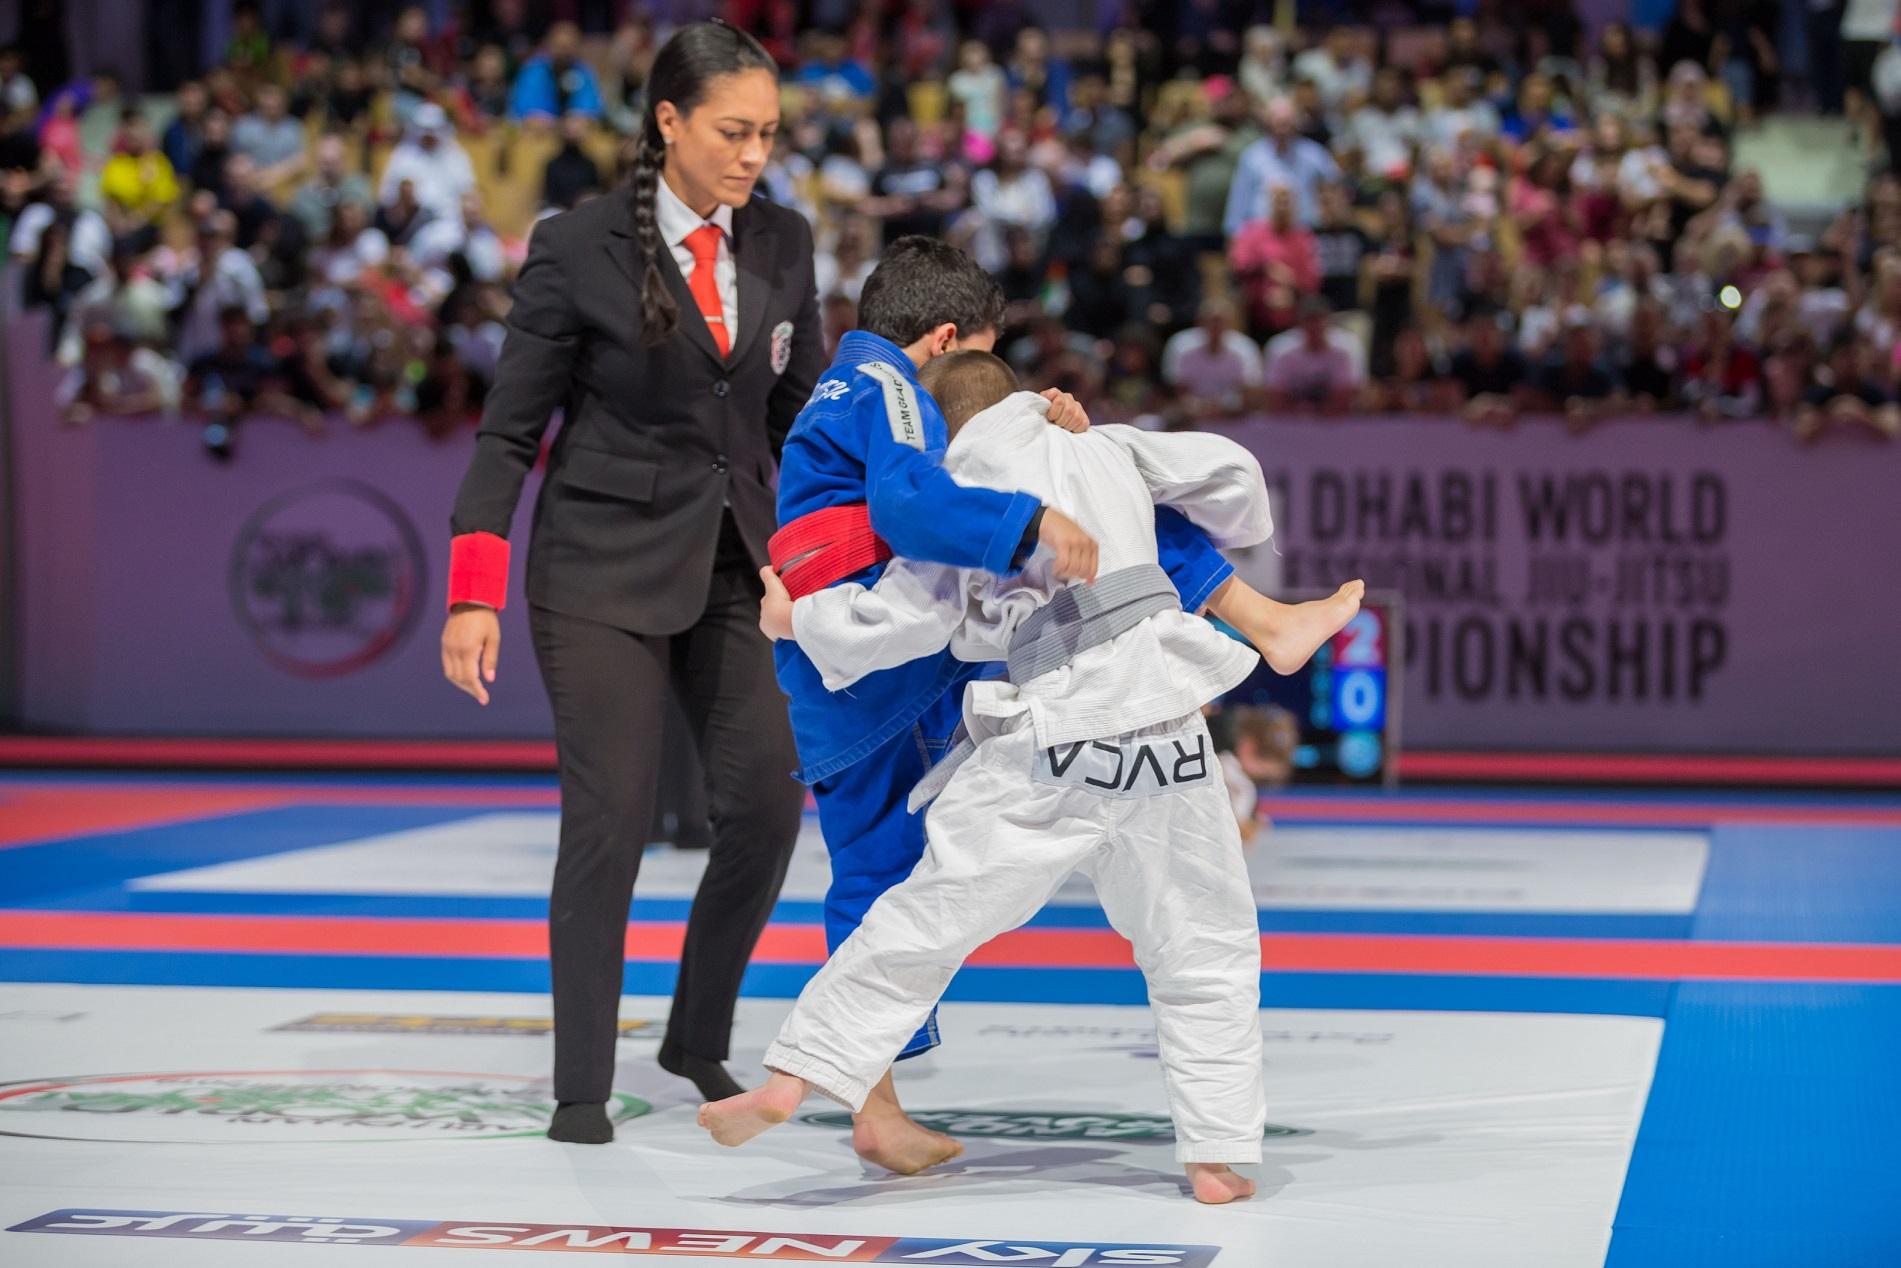 abu dhabi world professional jiu-jitsu championship shows jiu-jitsu is a sport for all 5.jpg